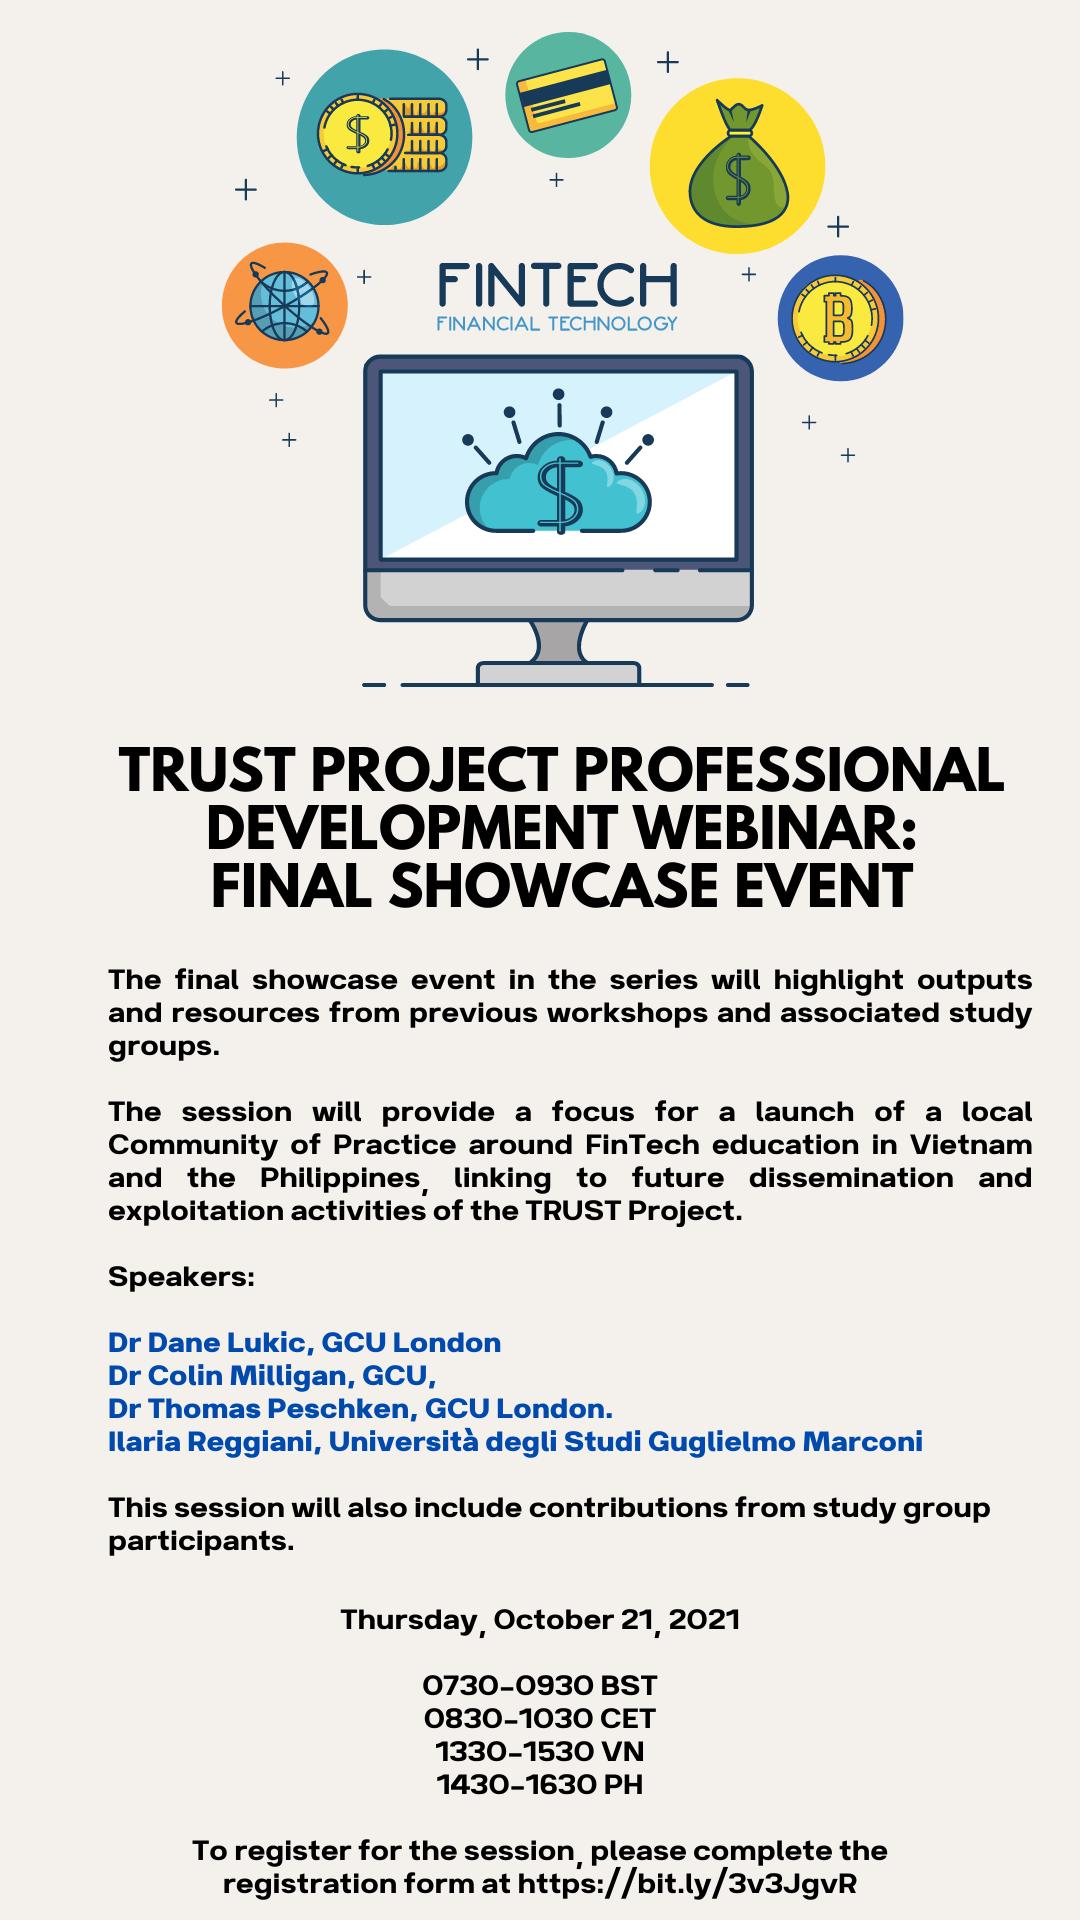 TRUST Project Professional Development Webinar: Final Showcase Event